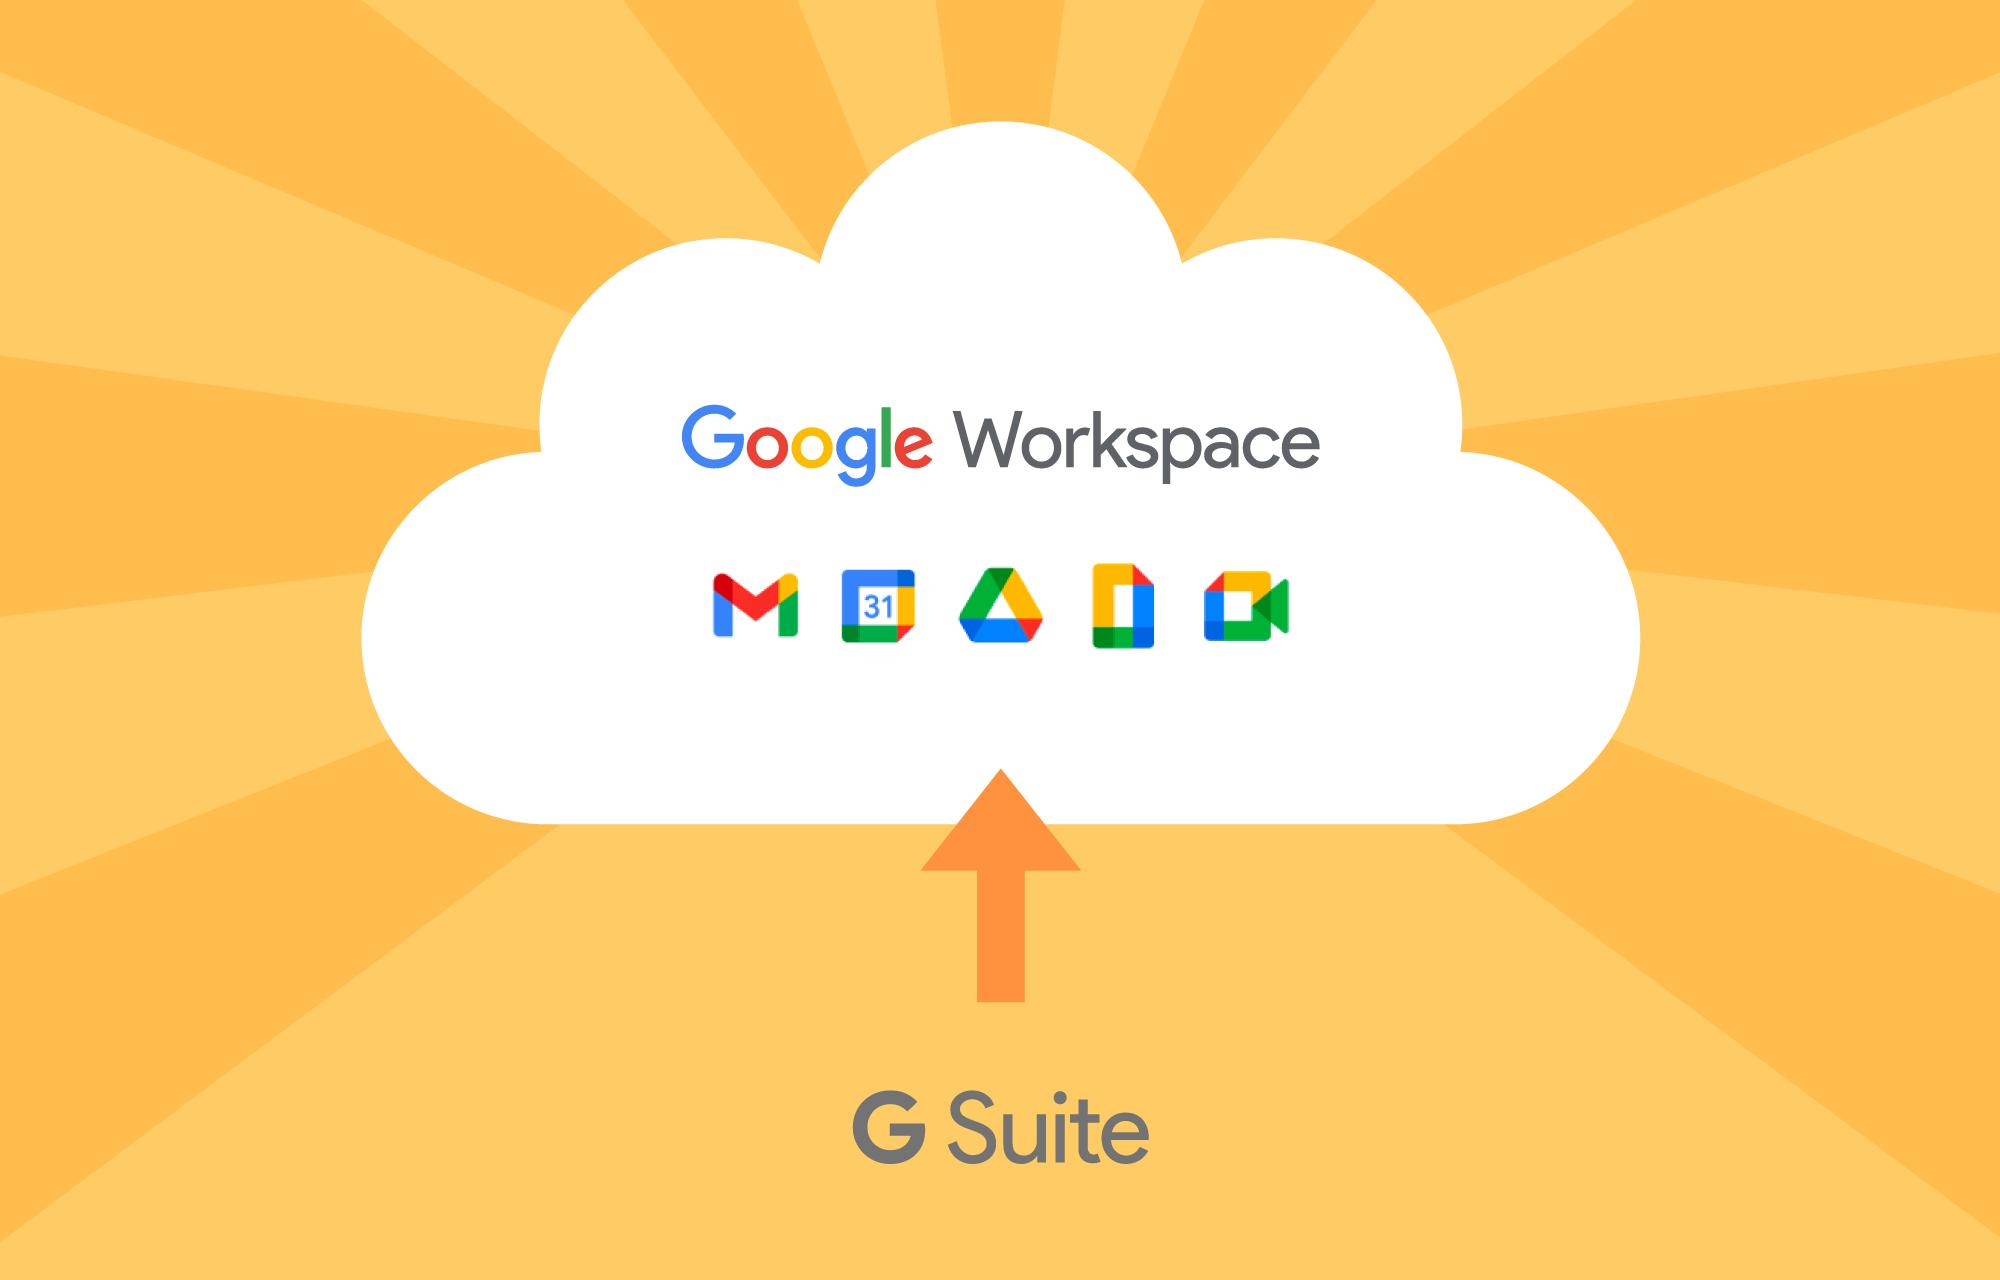 G Suite er historie – ta vel imot Google Workspace!